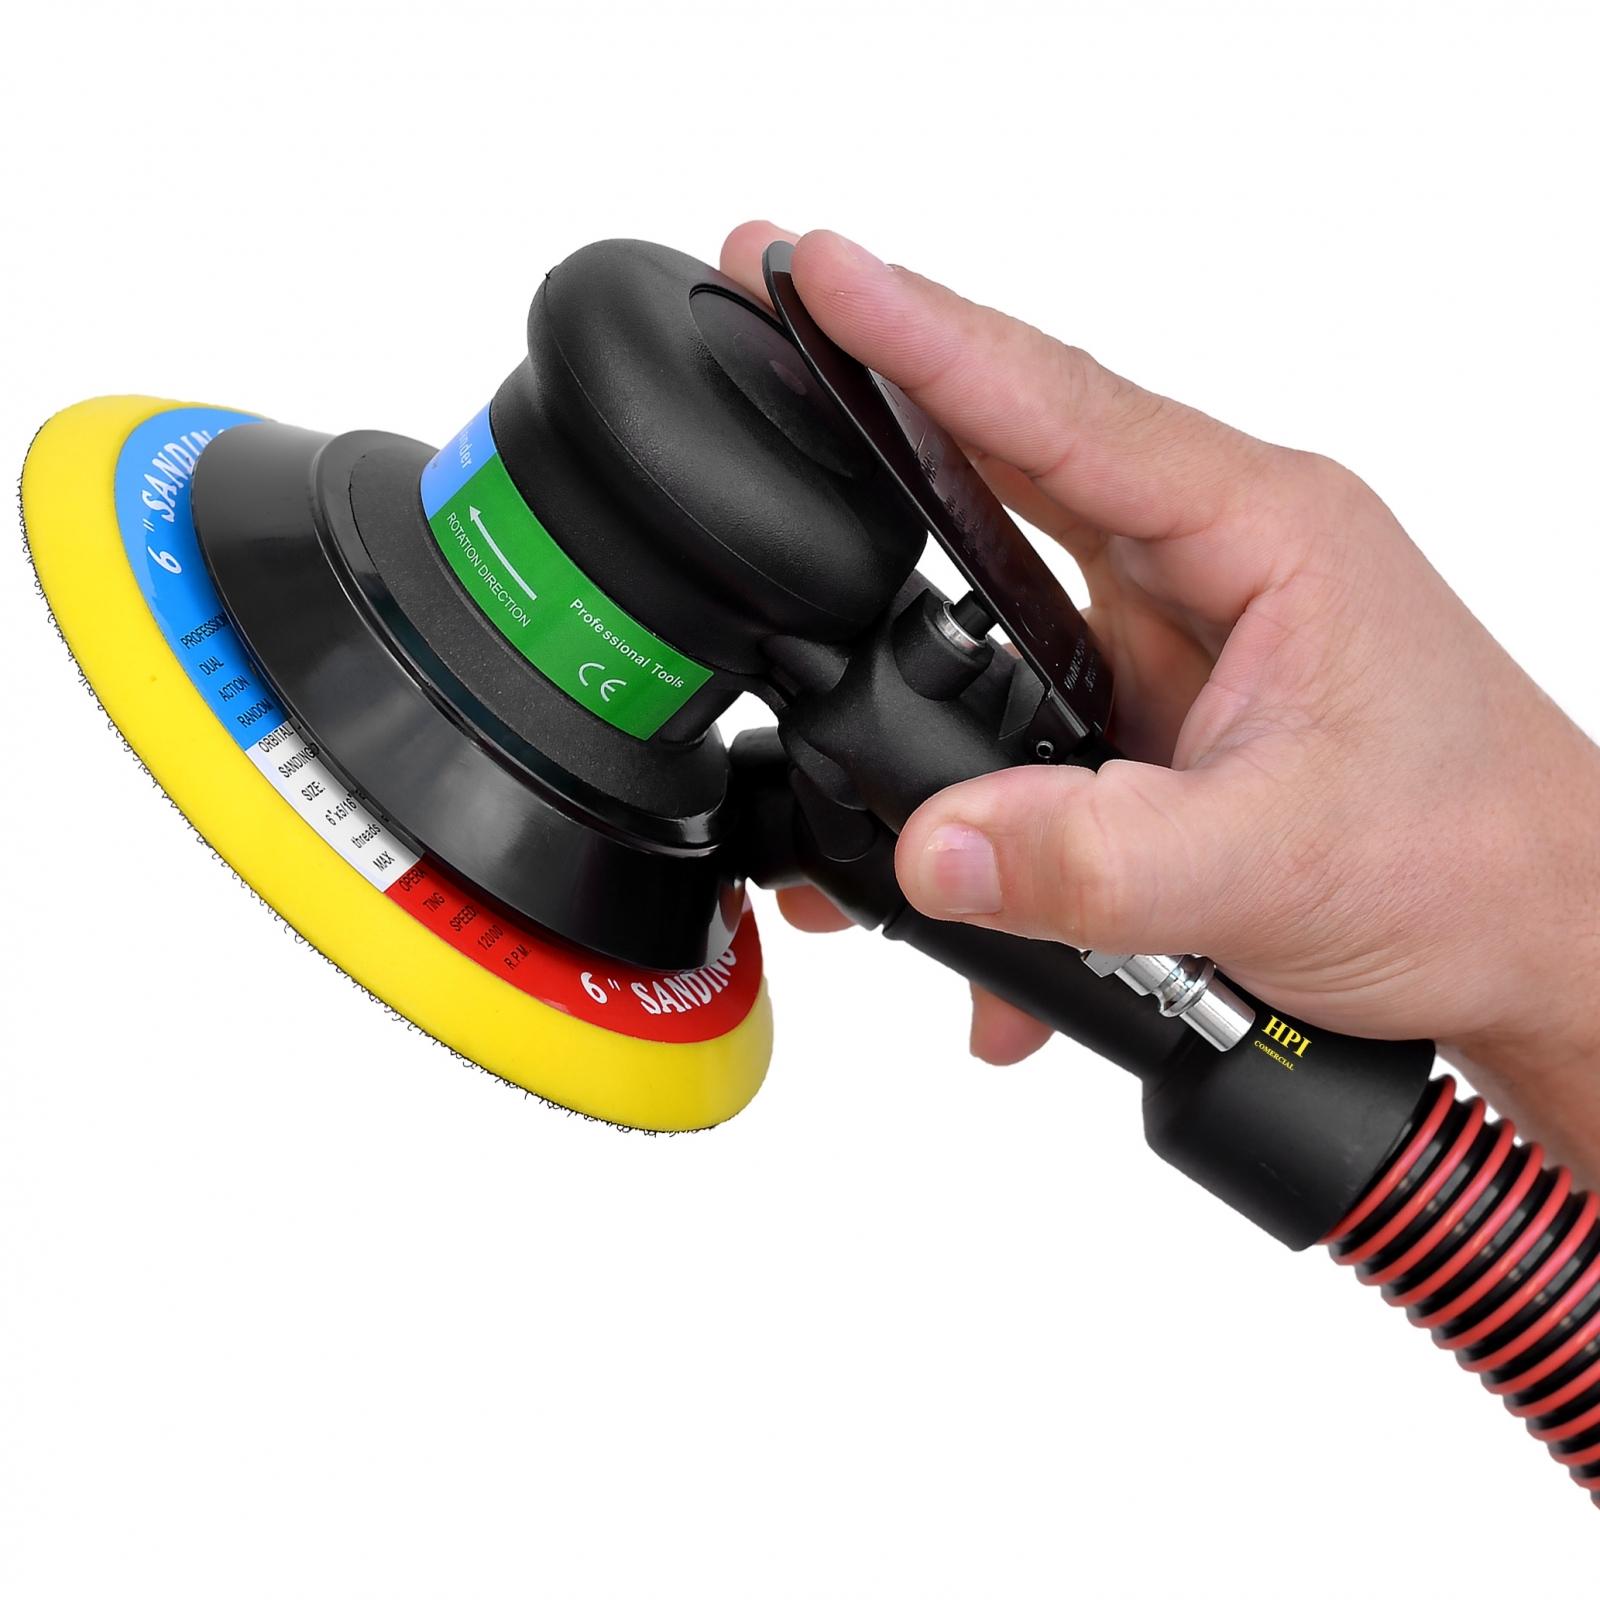 Lixadeira Pneumática Roto Orbital Hookit PDR Pro-400 - Ferramentas MEP